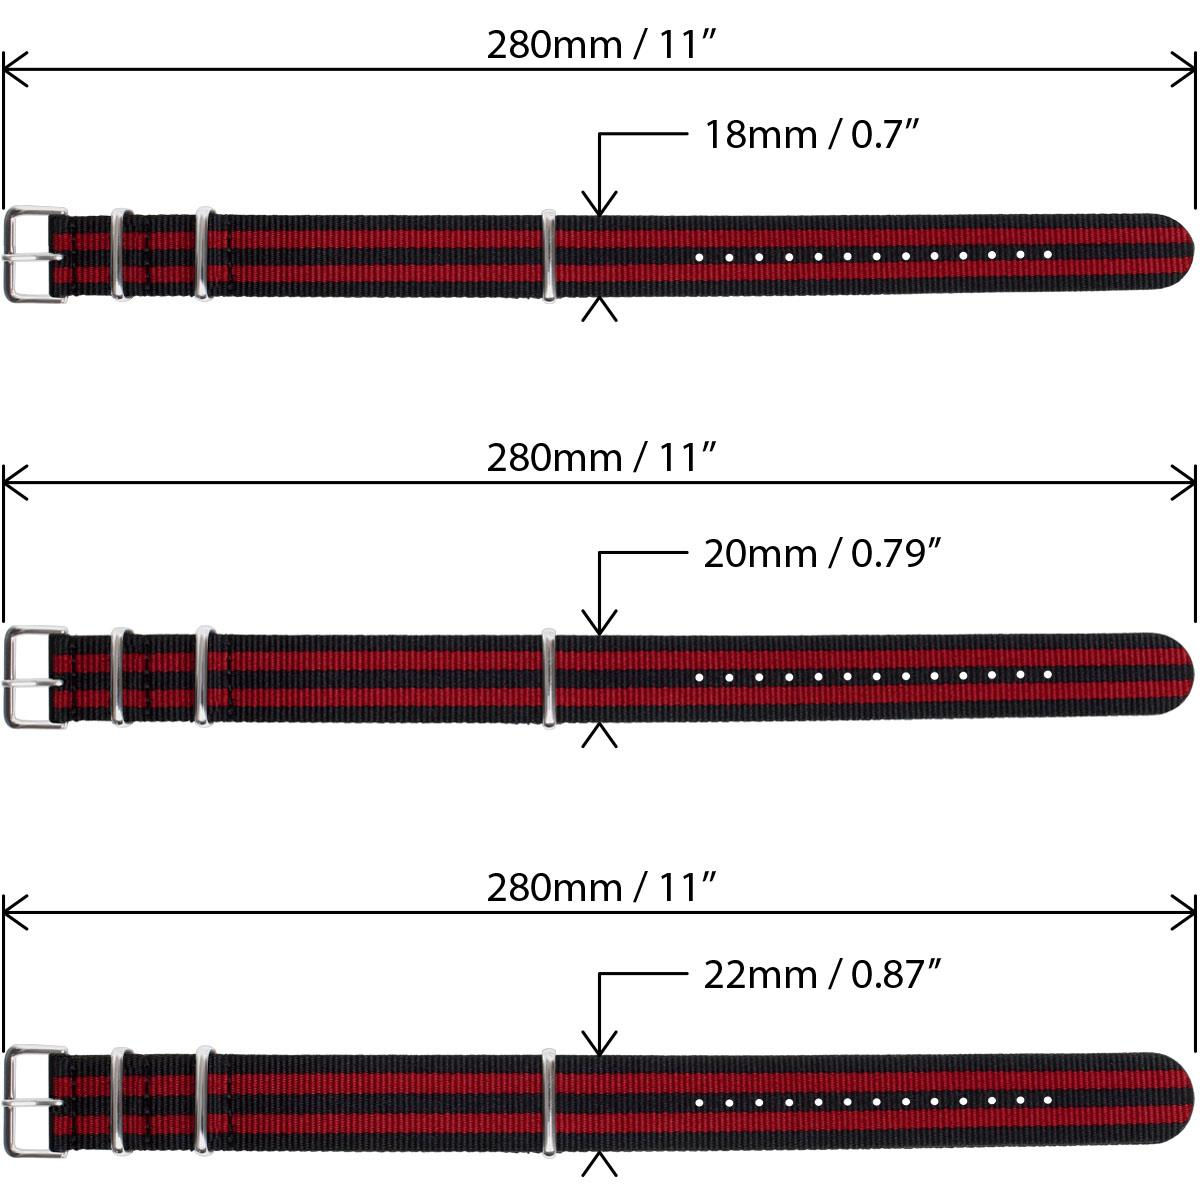 Nato-Watch-Strap-Nylon-Men-Wrist-18mm-20mm-22mm-Smart-Military-Pin-Straps miniatuur 16